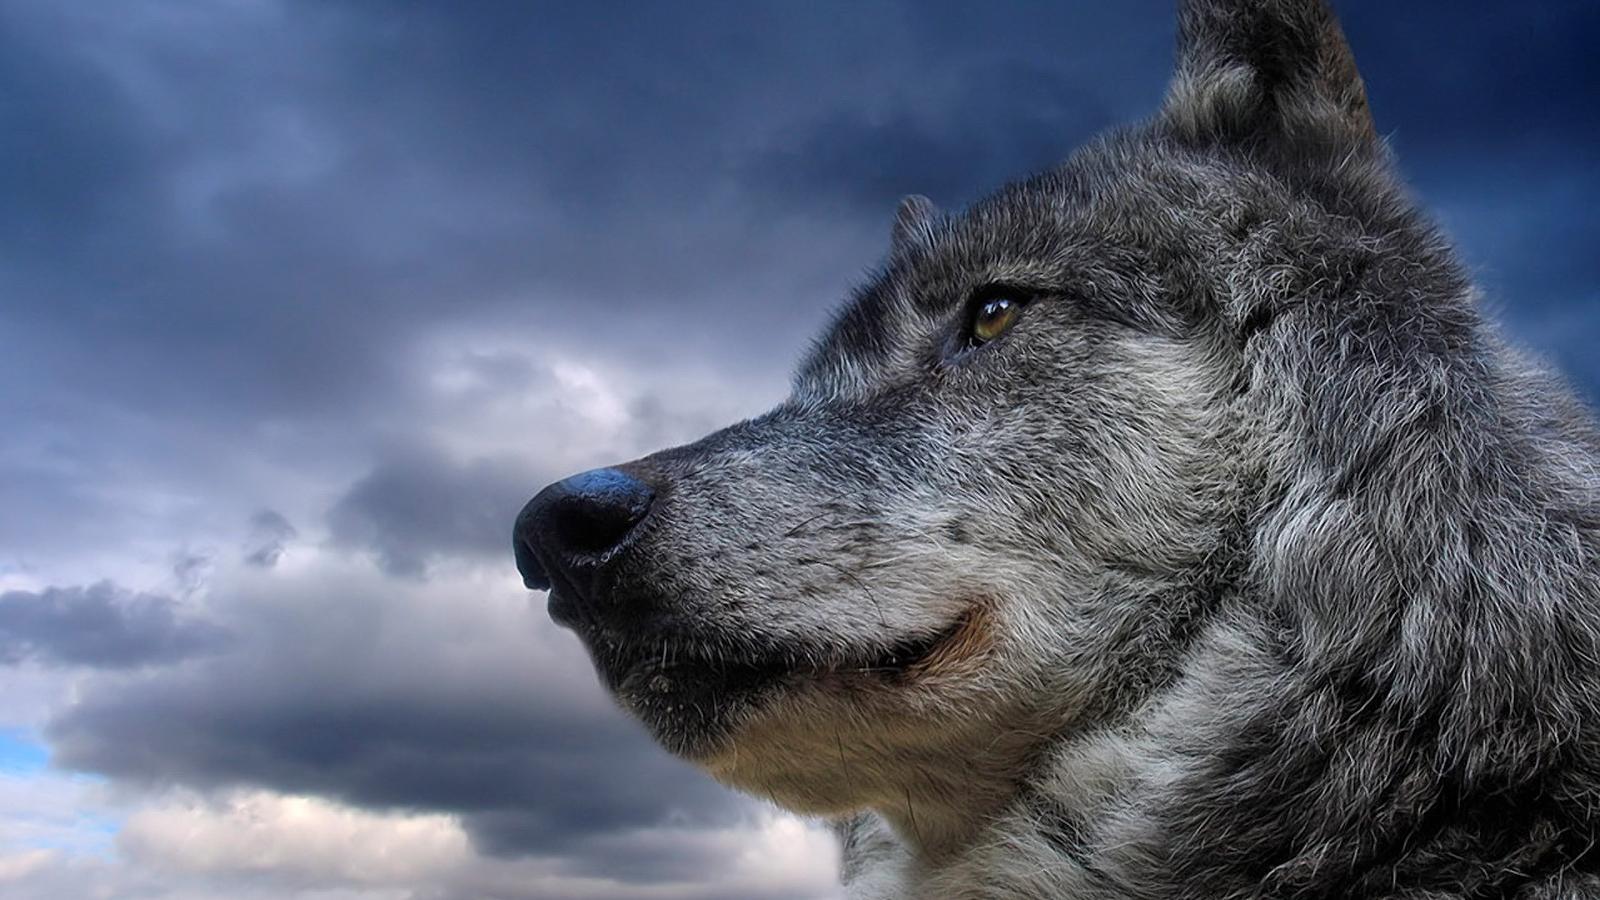 Hd wolf live wallpaper 1600x900